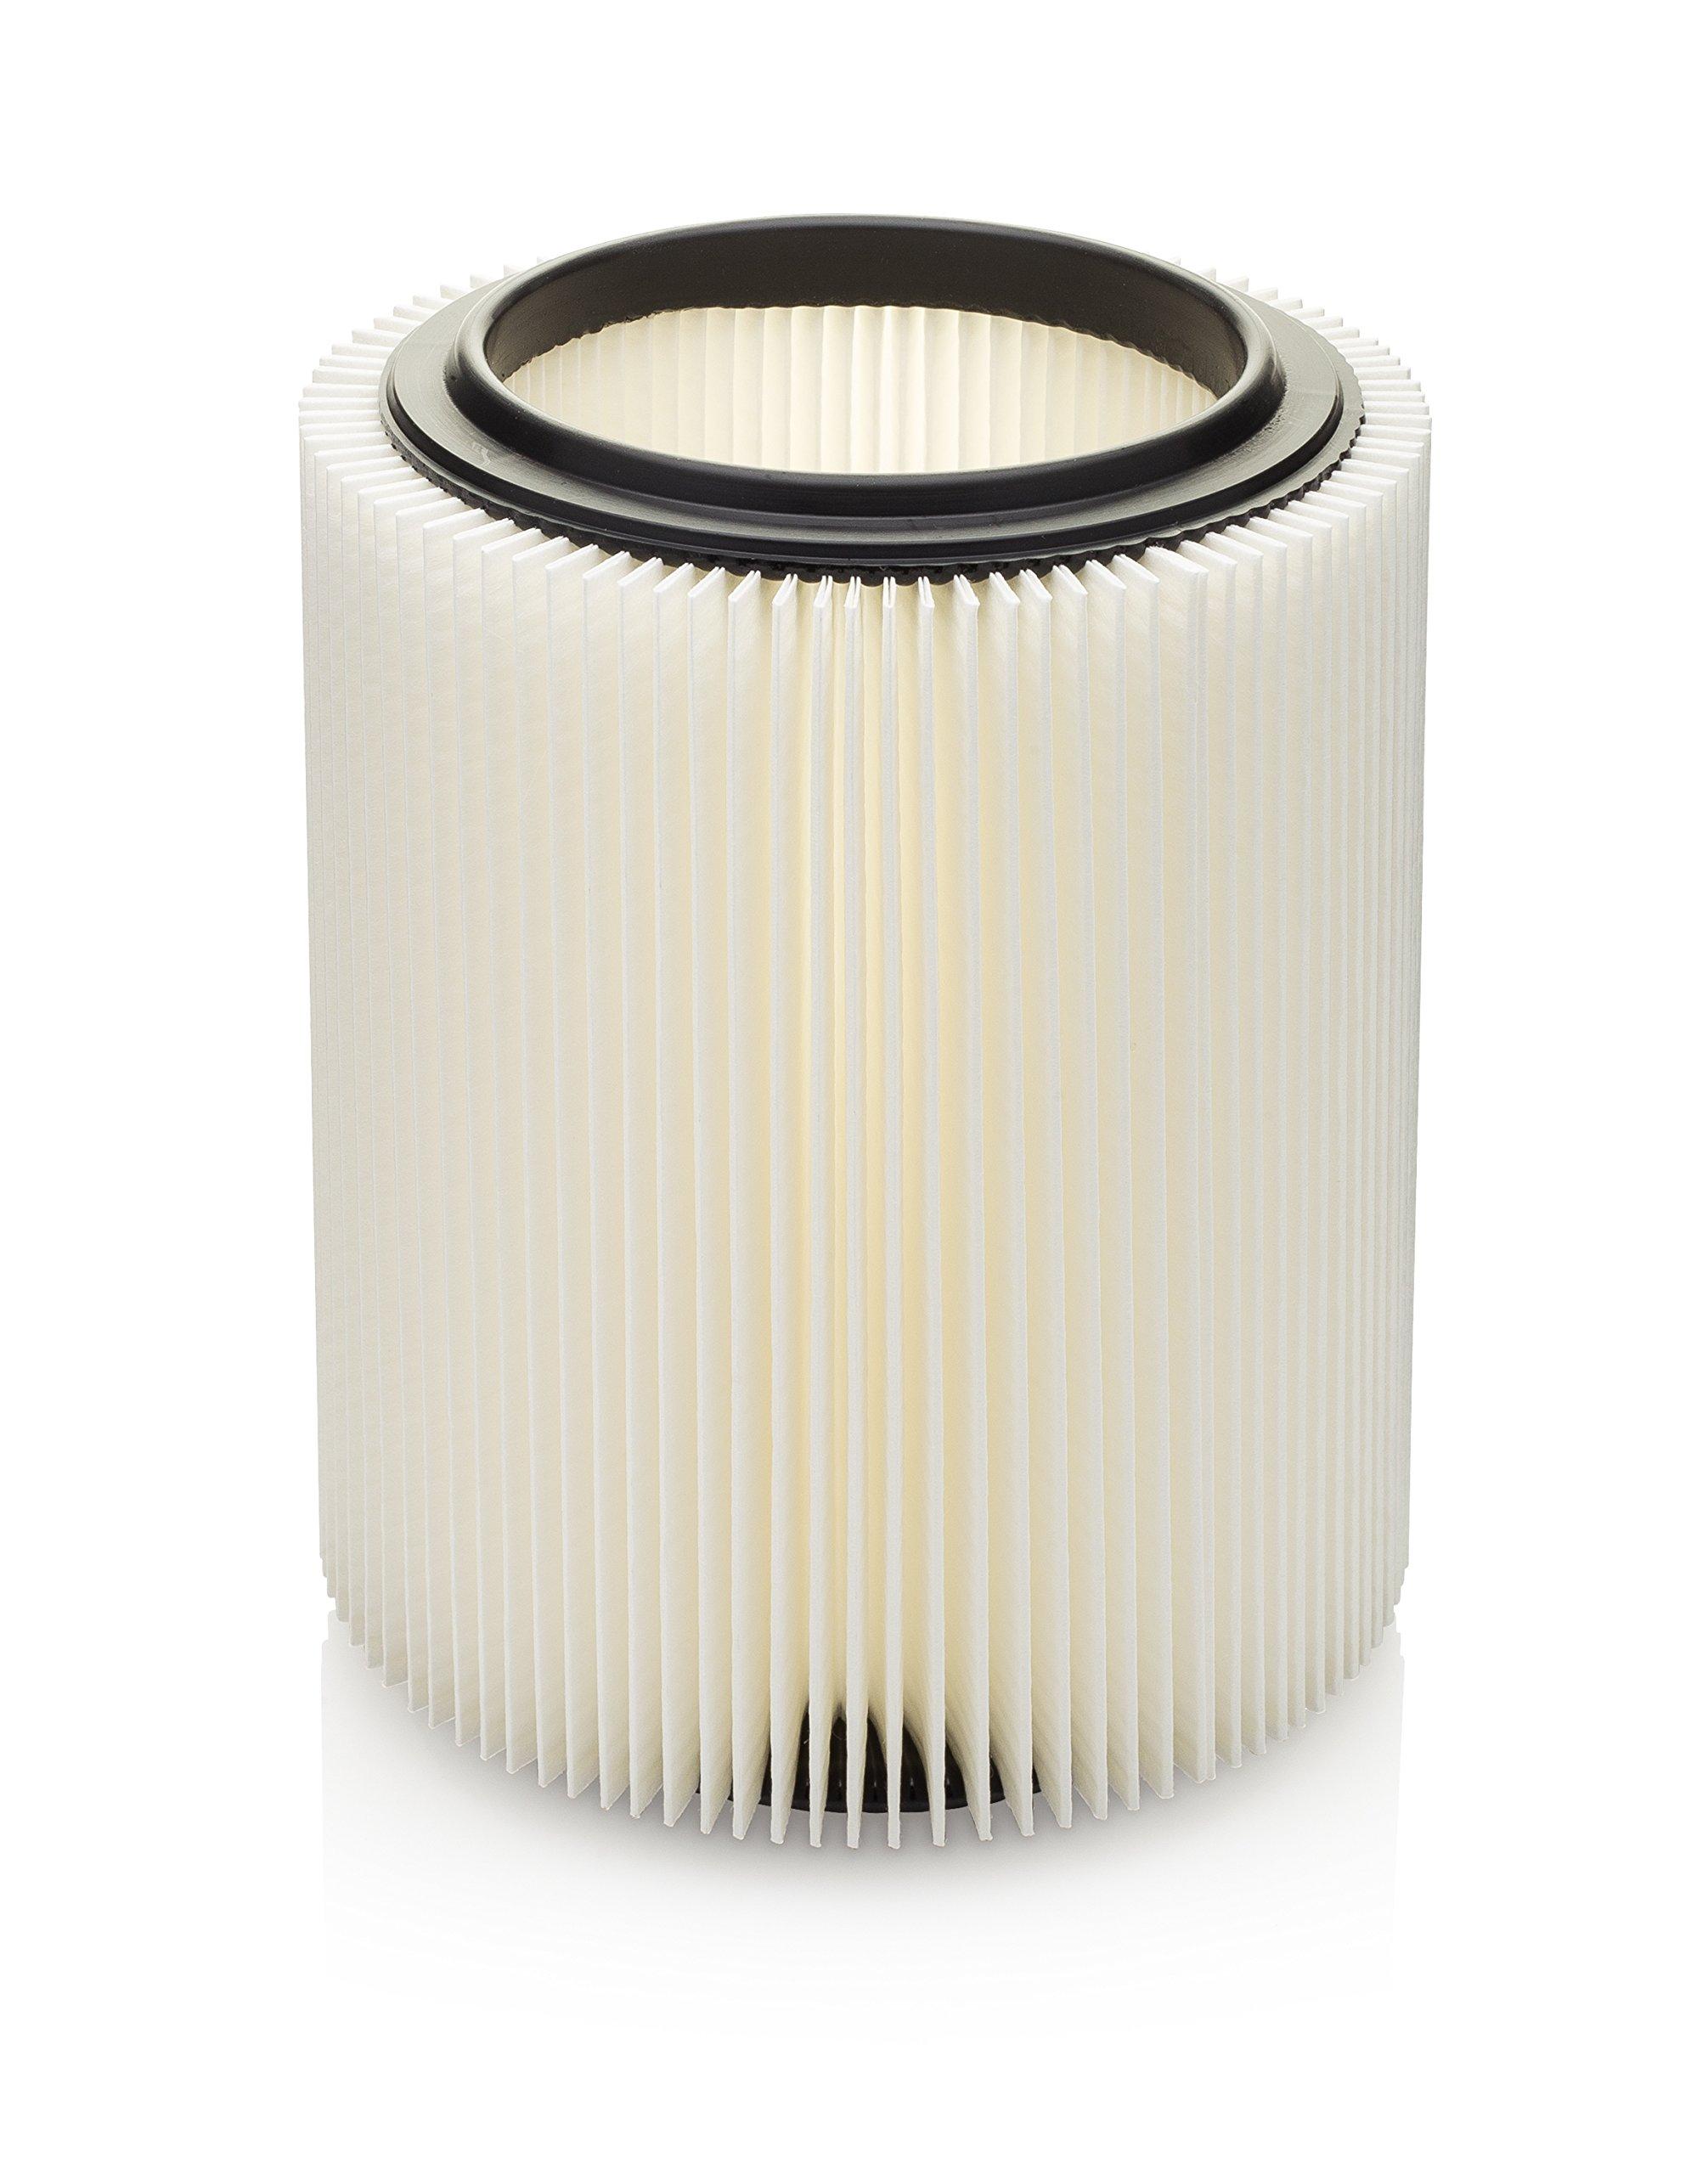 Craftsman & Ridgid Replacement Filter by Kopach, 1 Pack, Original Filter by Kopach Filter